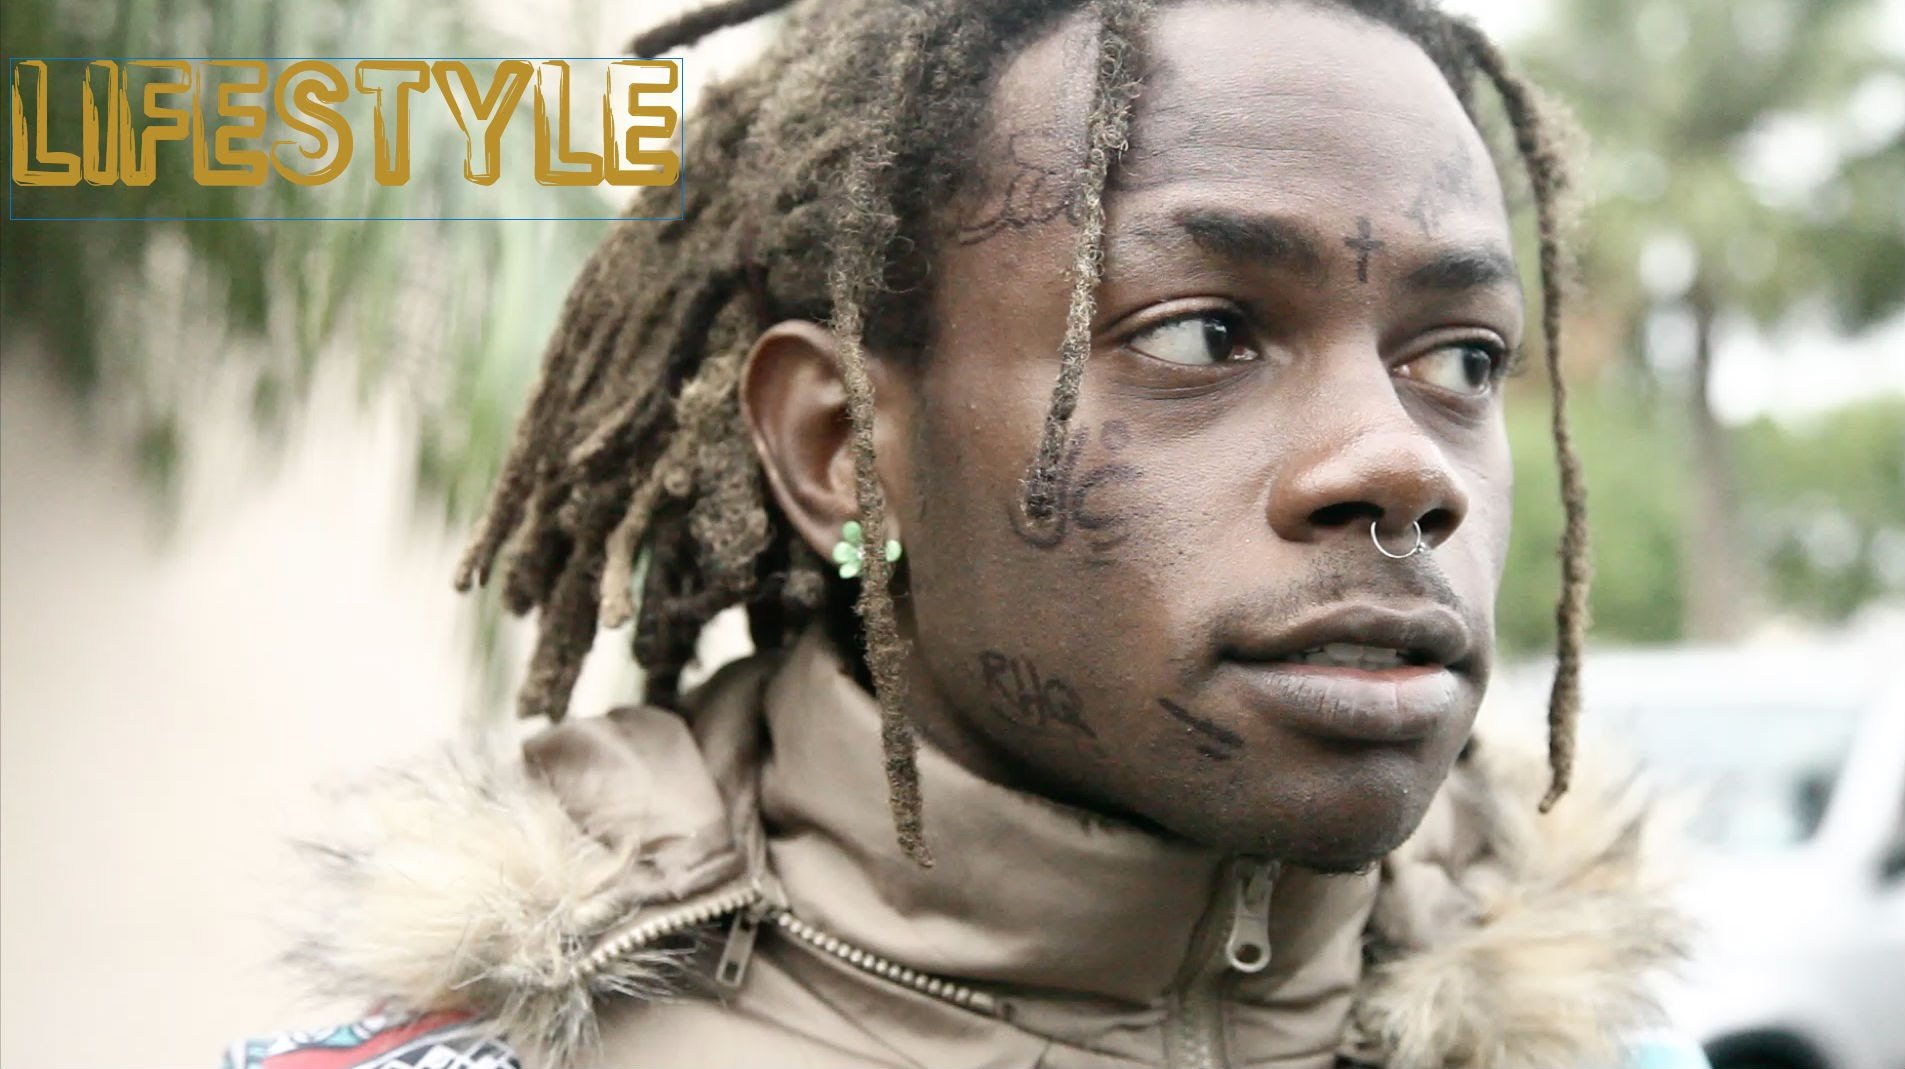 YOUNG THUG gangsta rapper rap hip hop 1ythug wallpaper 1905x1069 1905x1069